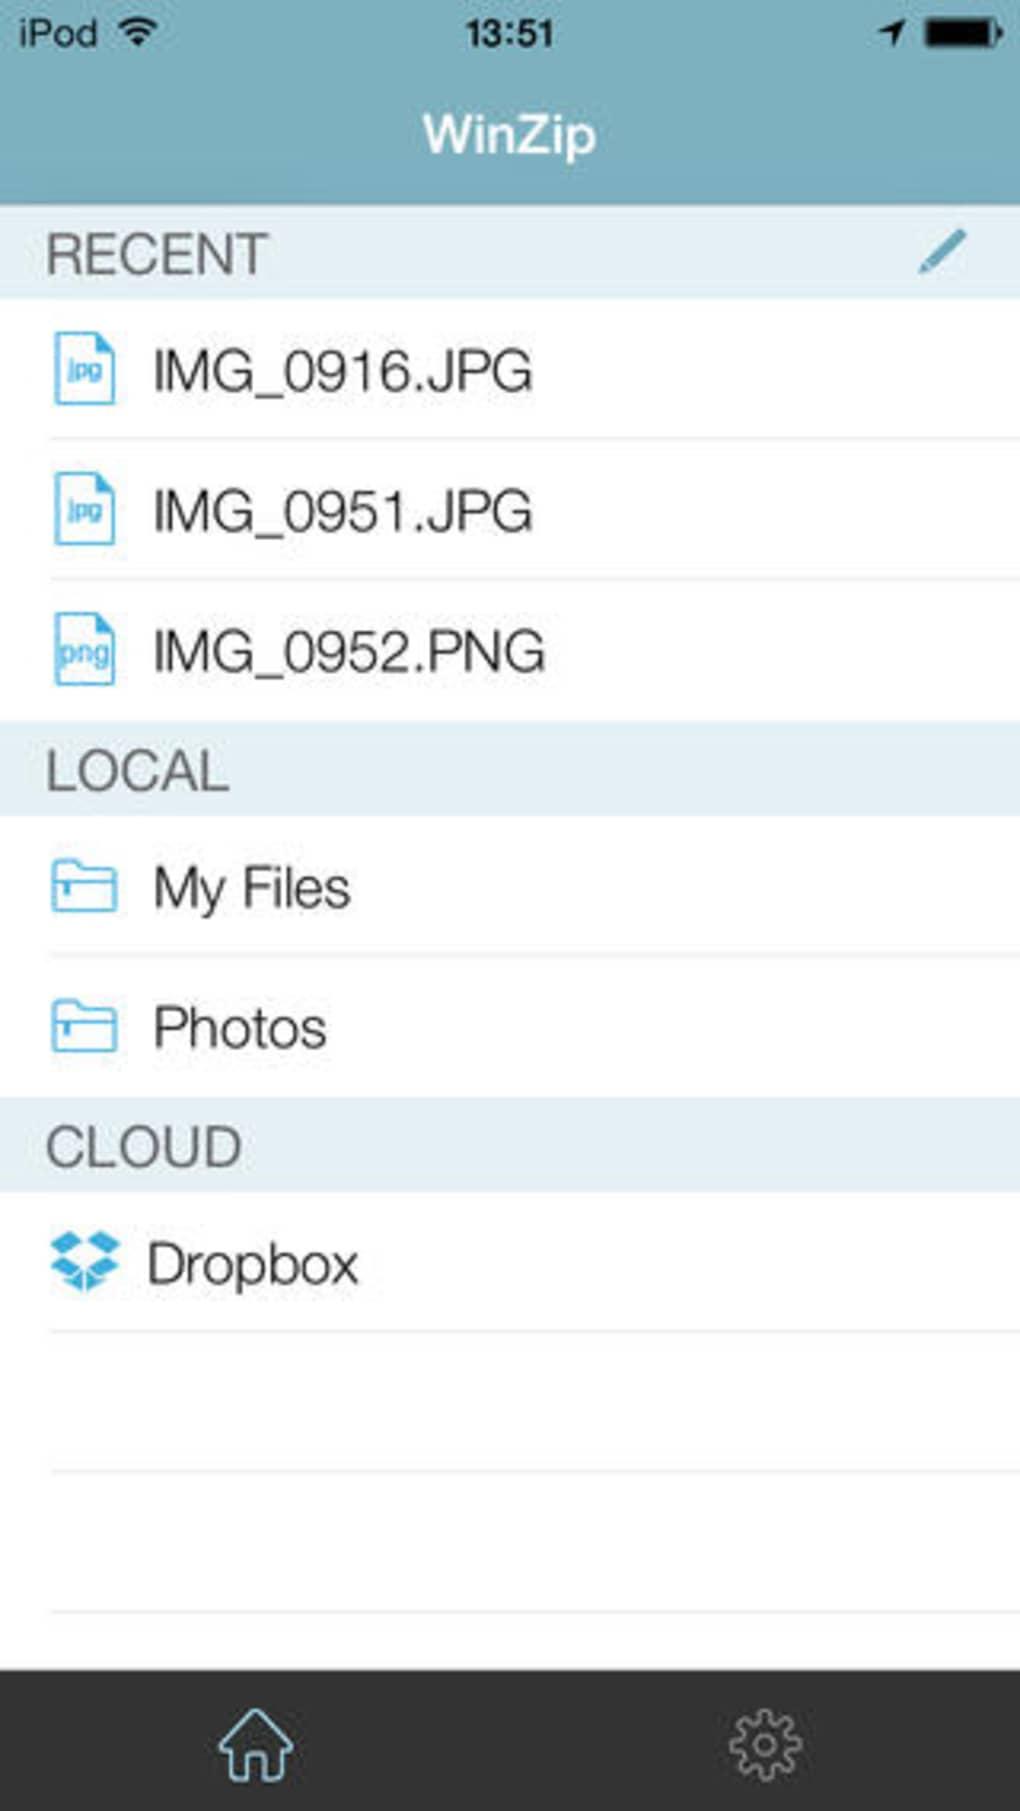 WinZip for iPhone - Download